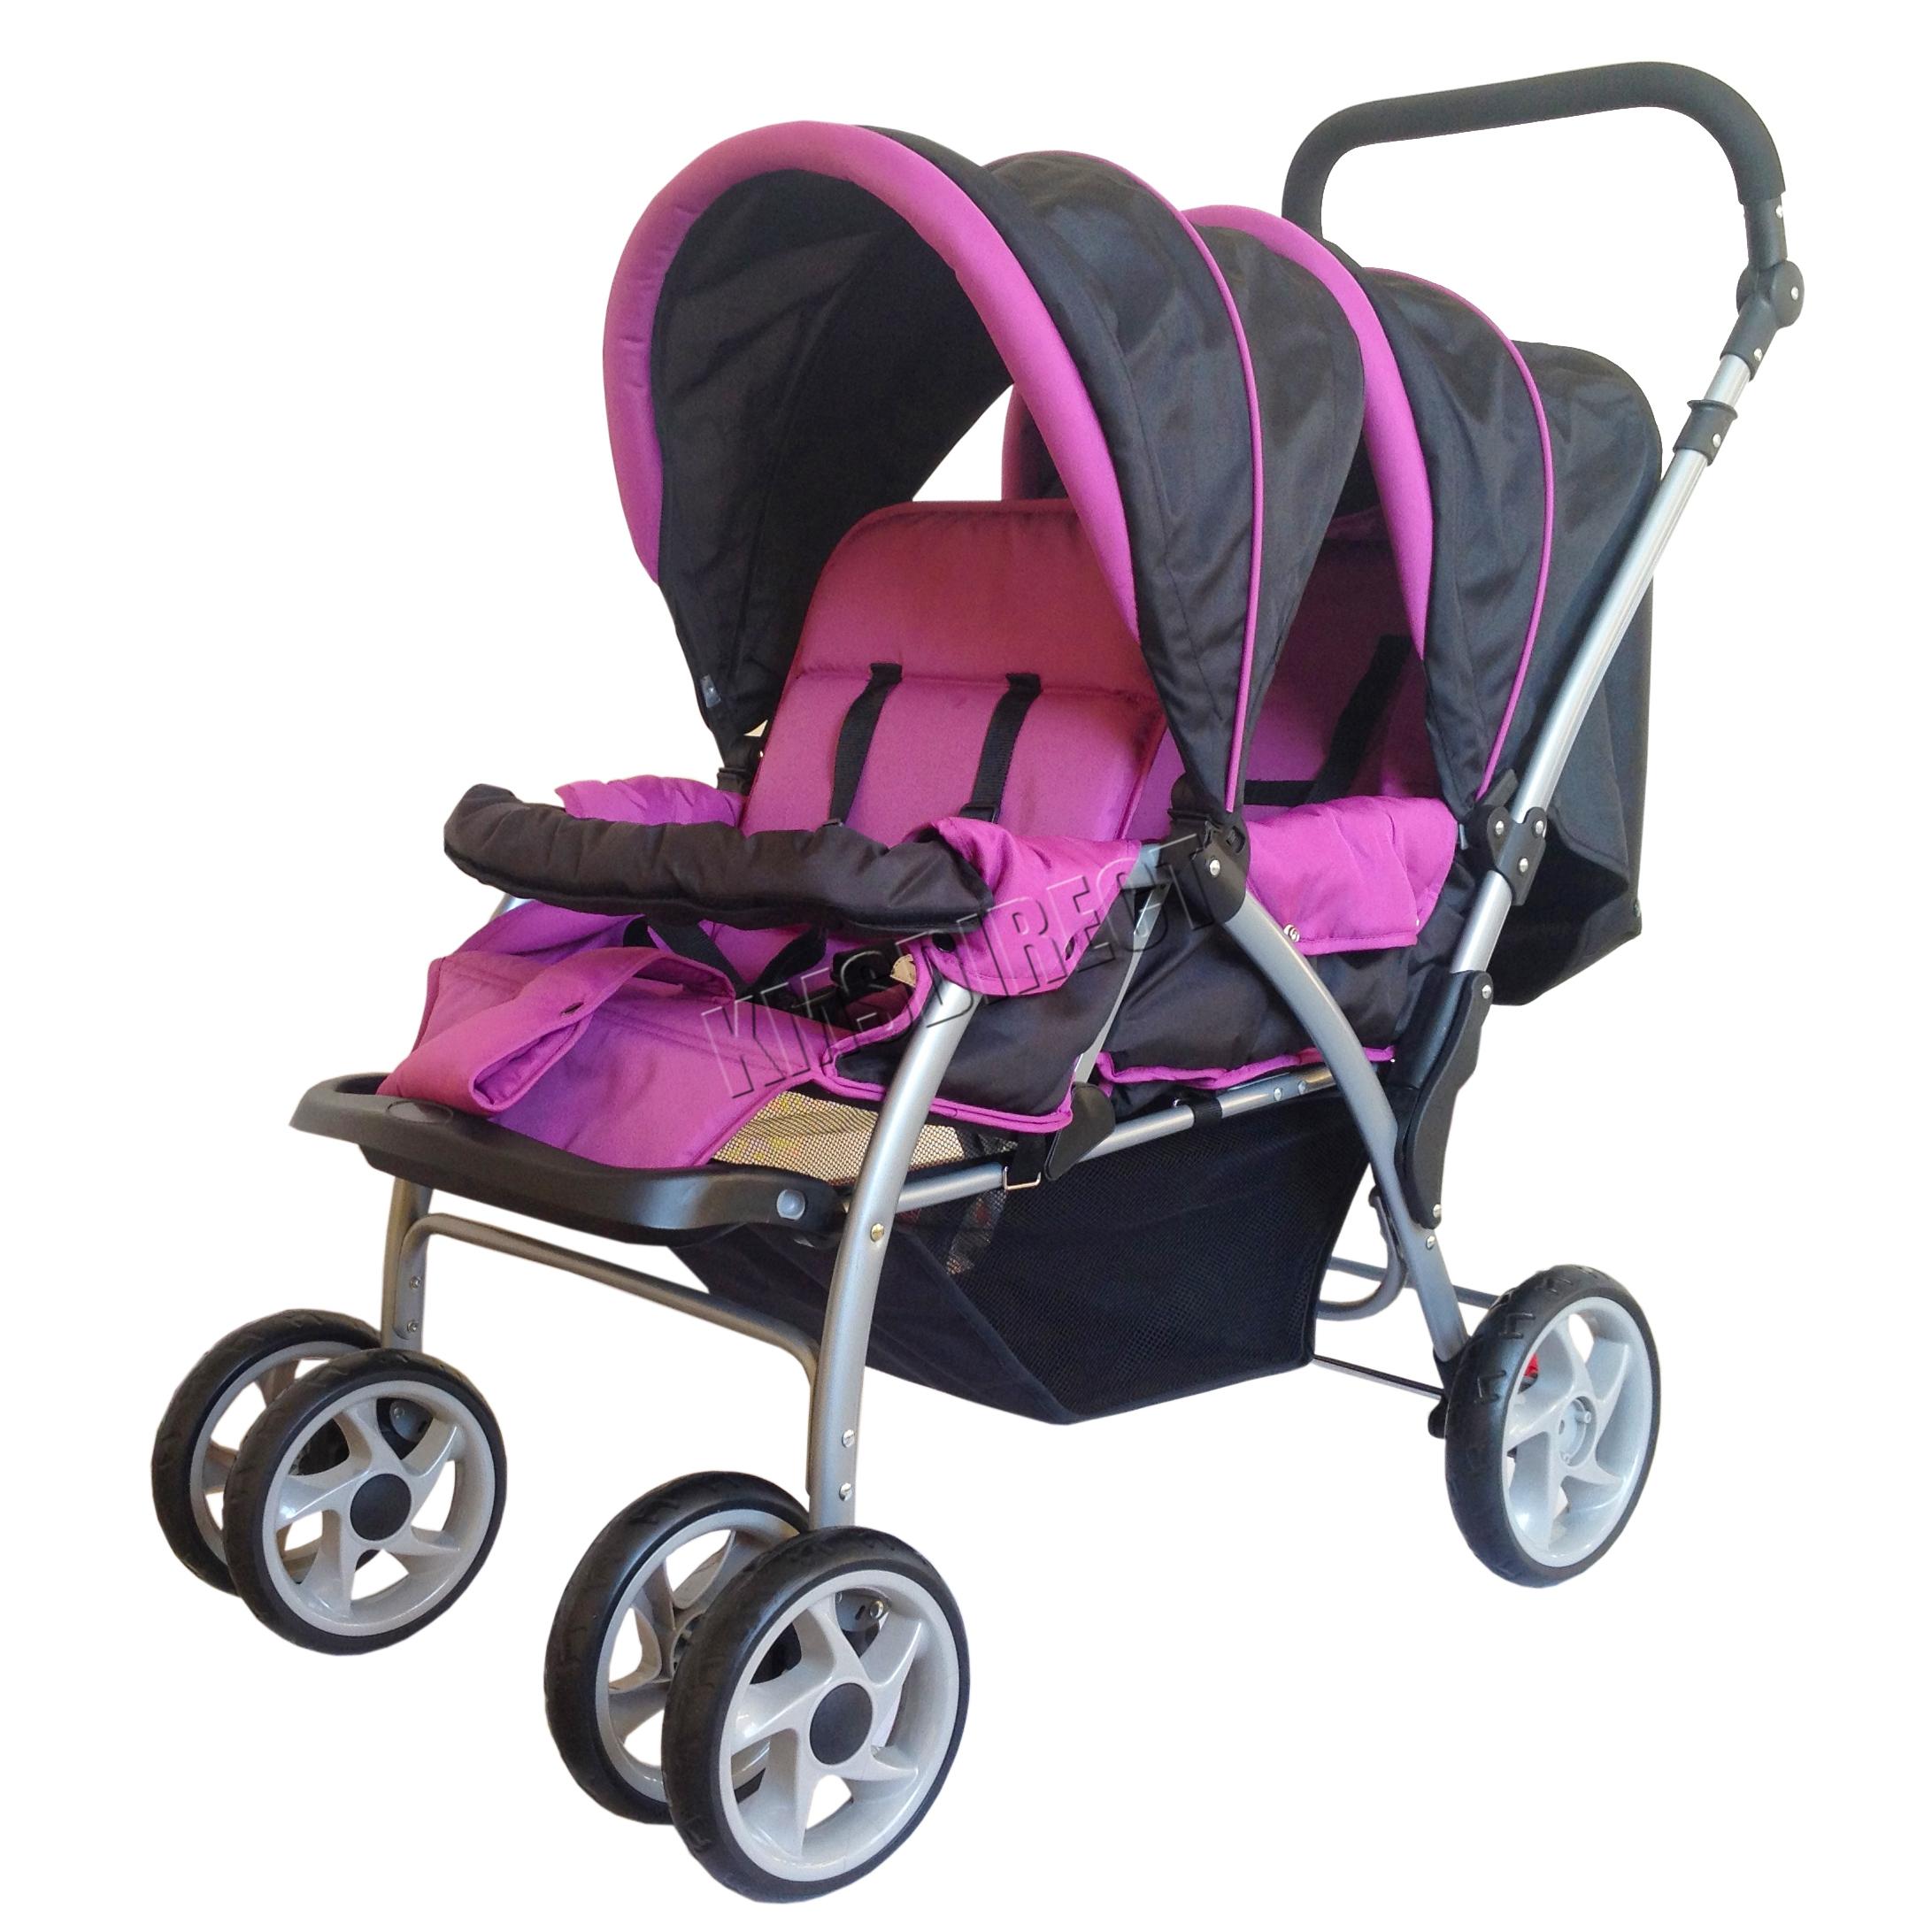 FoxHunter Baby Tandem Double Stroller Twin Pushchair Pram